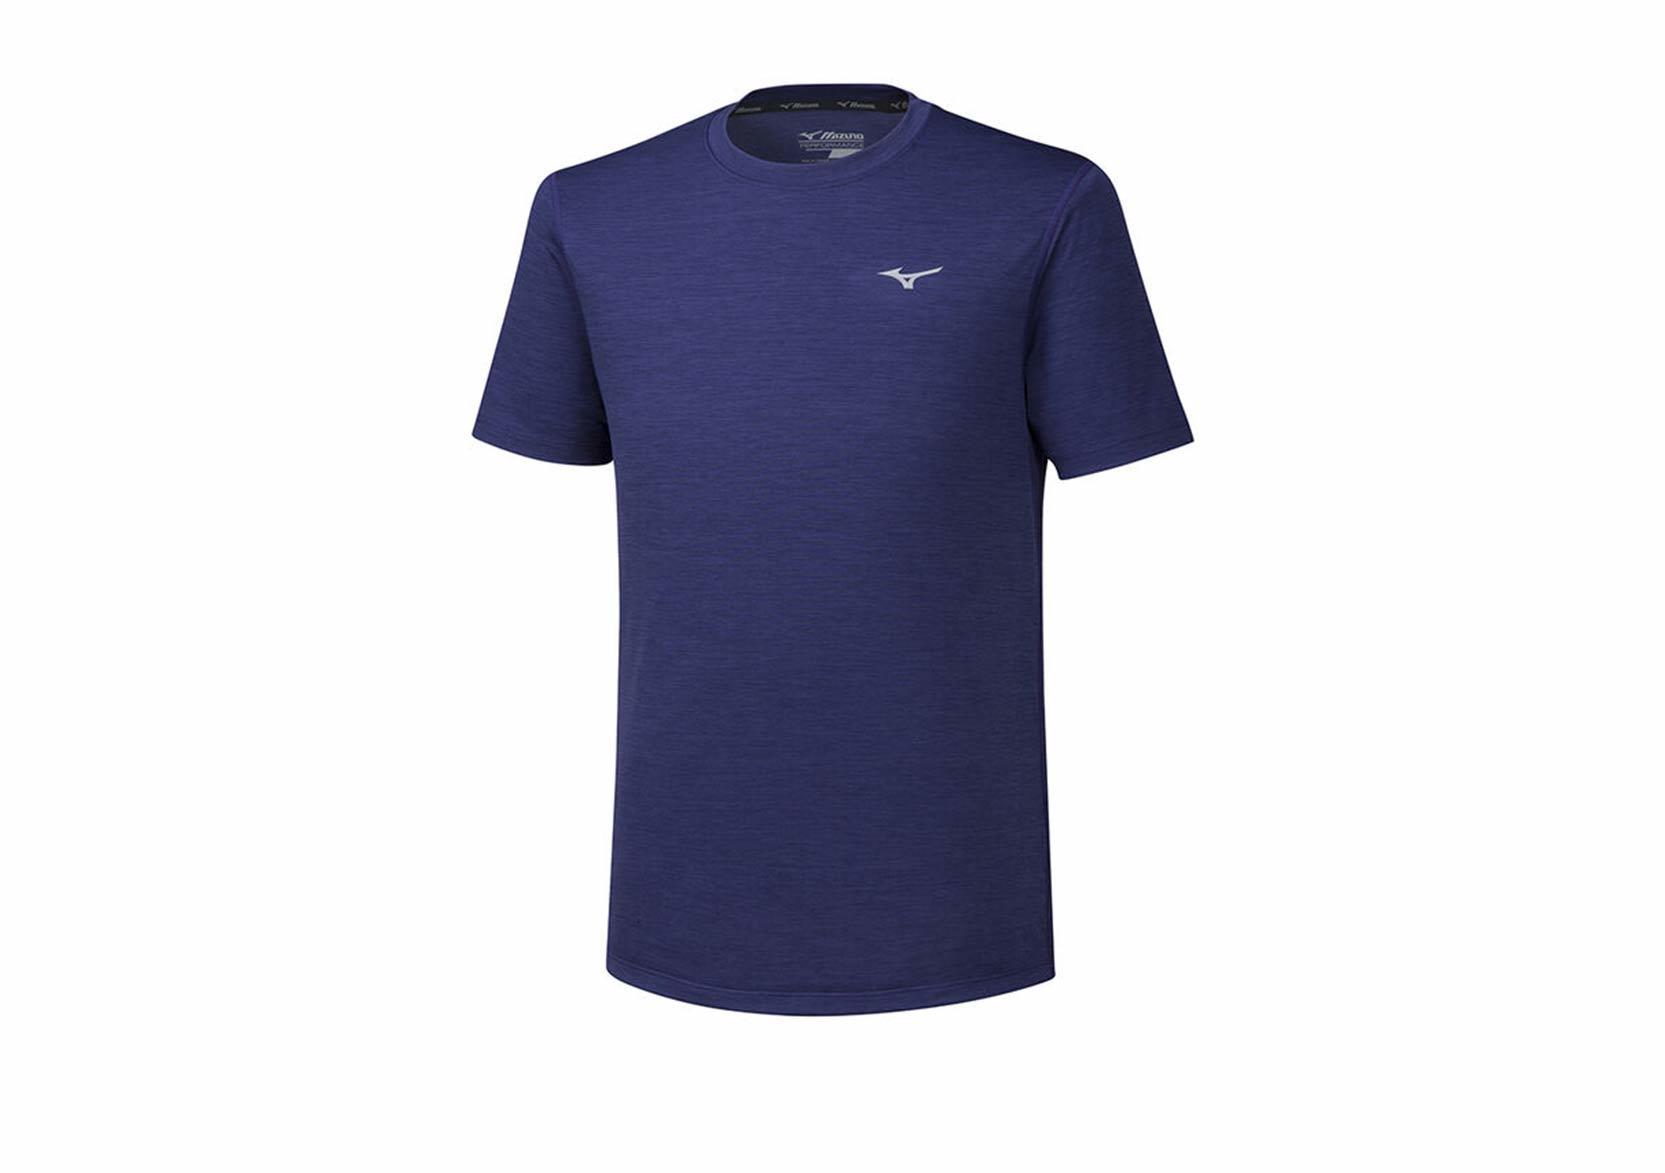 Mizuno Impulse Core Tee беговая футболка мужская темно-синяя - 1